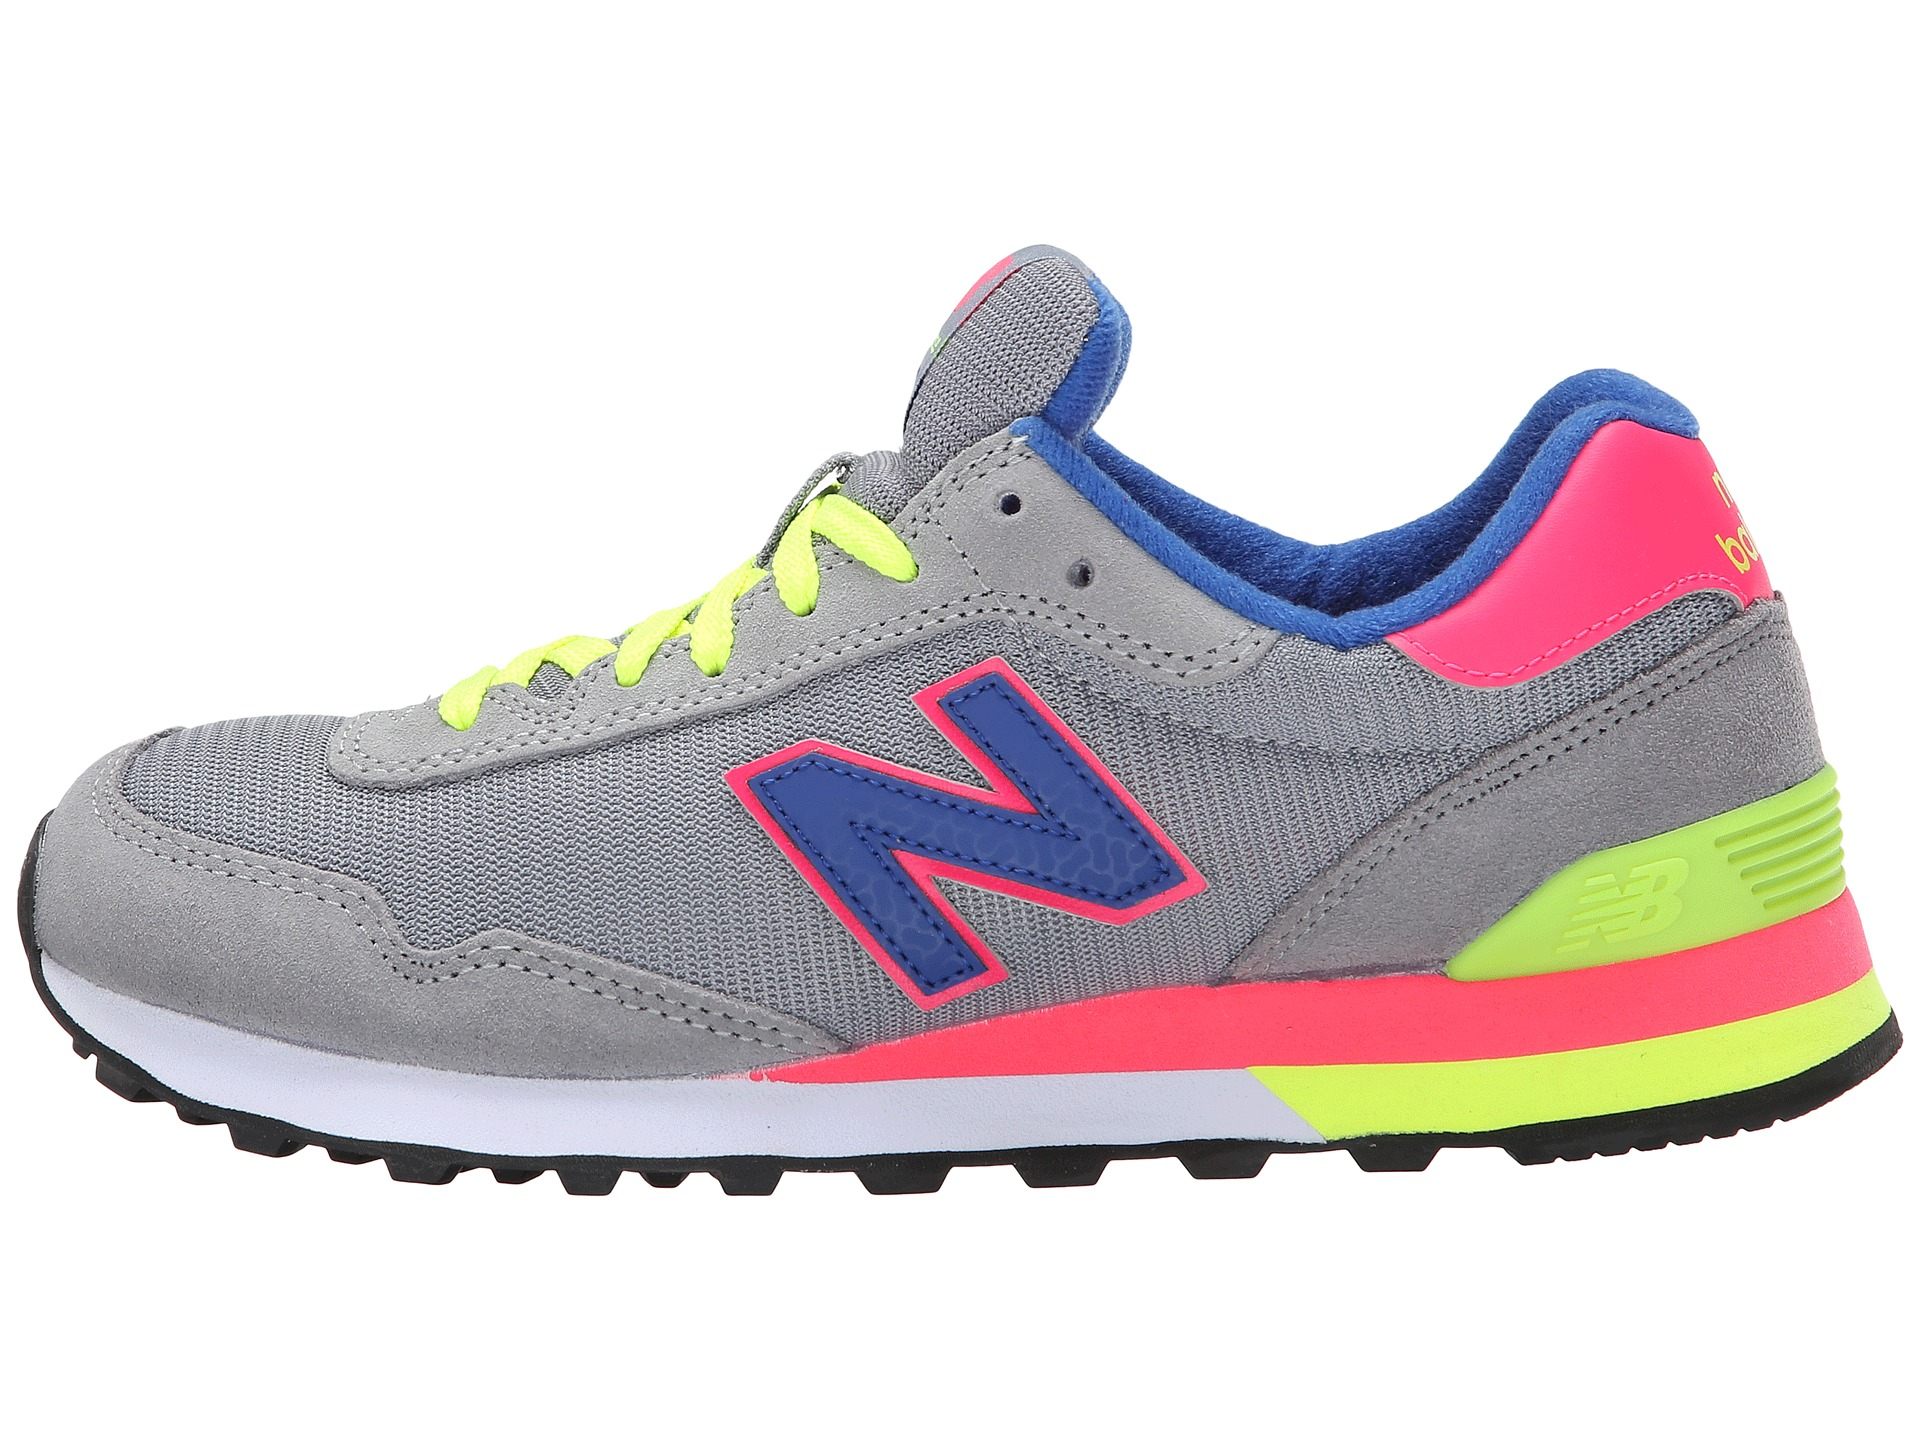 New Balance Classics 515 - Neon Pop Grey/Pink - Zappos.com